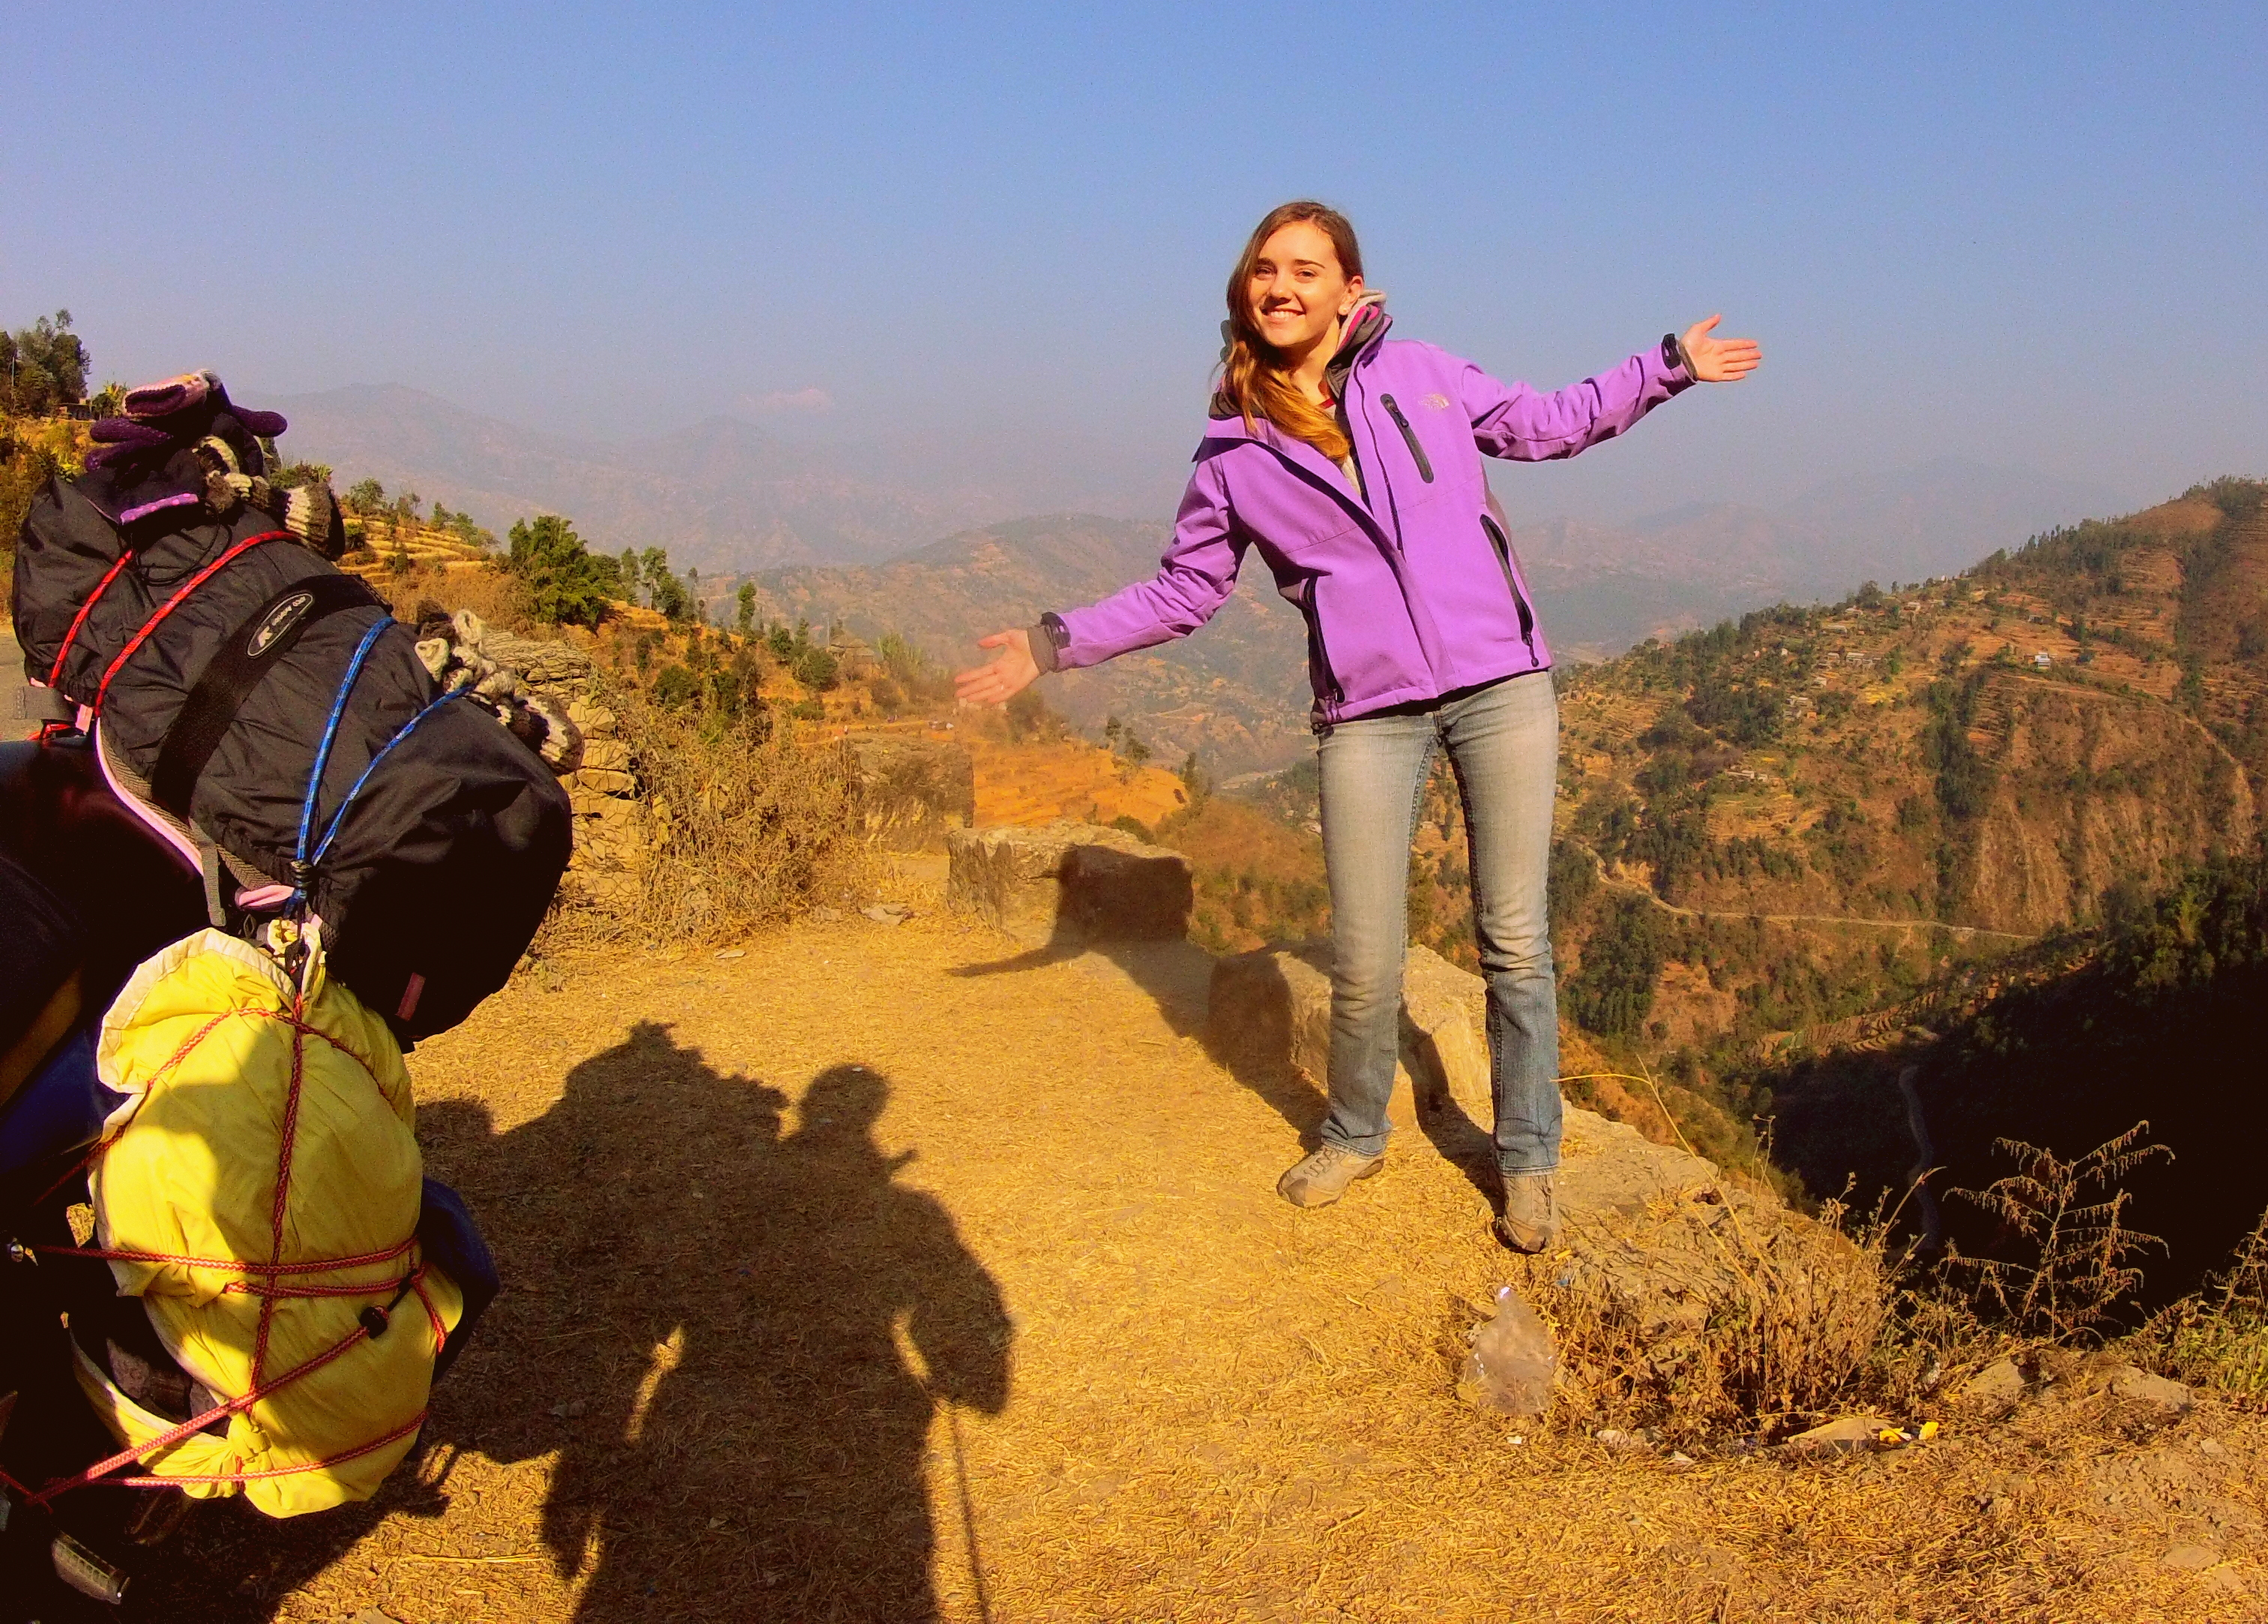 On the mountain roads to Chitwan, Nepal